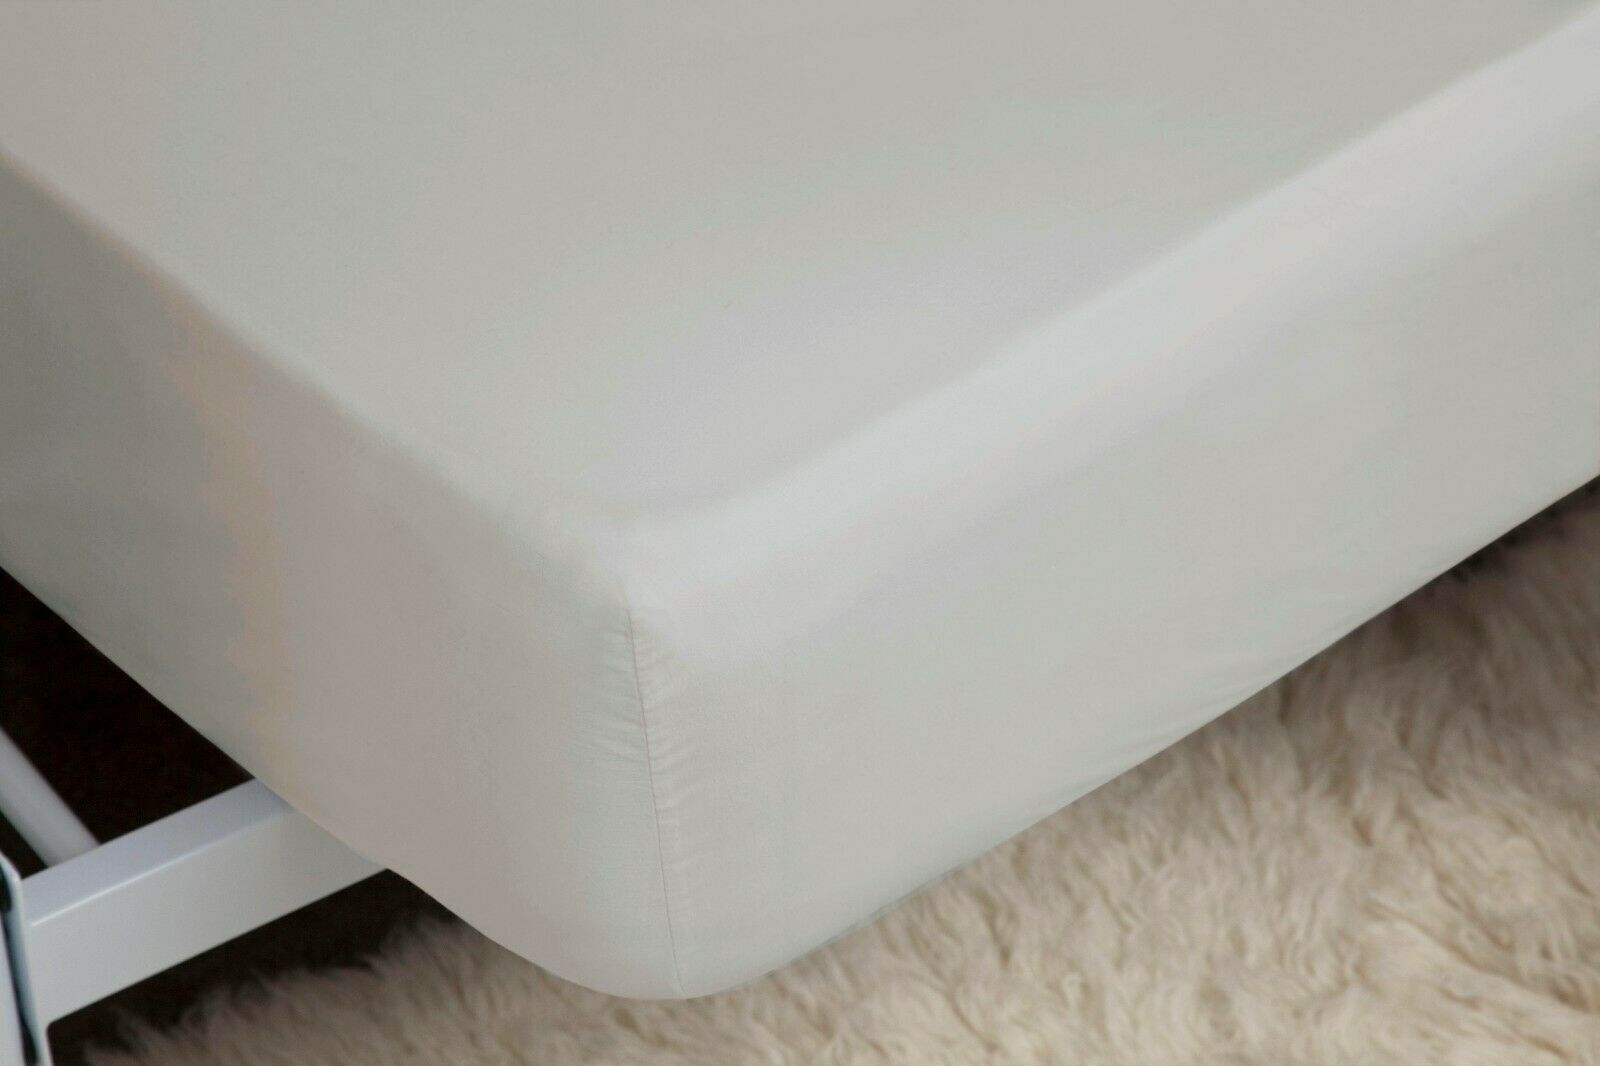 450 Thread Count Pima Cotton Deep SuperKönig Fitted Sheet Platinum grau 38cm